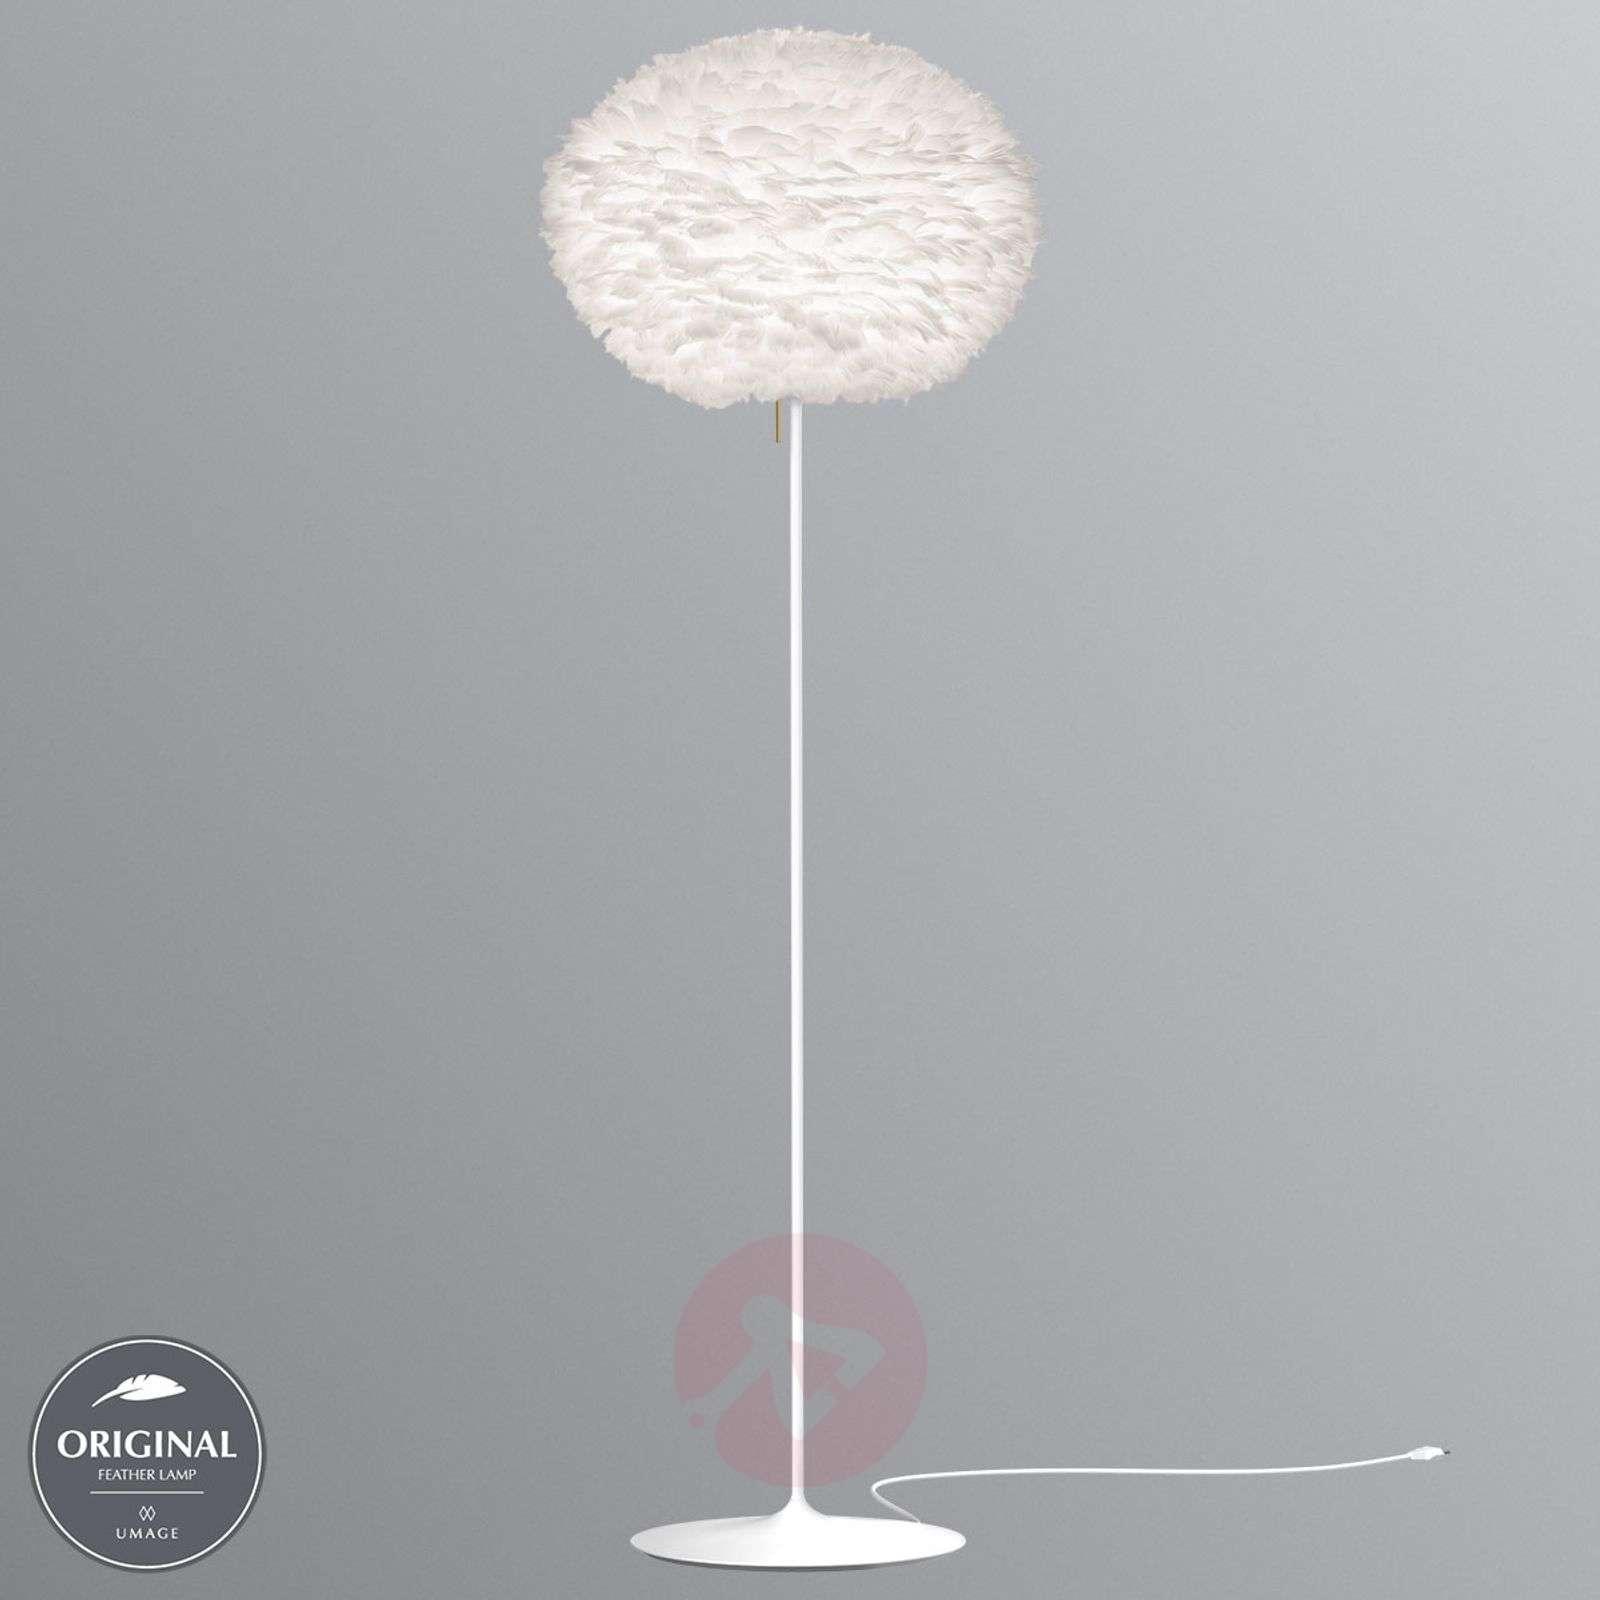 UMAGE Eos floor lamp, white-9521118-01